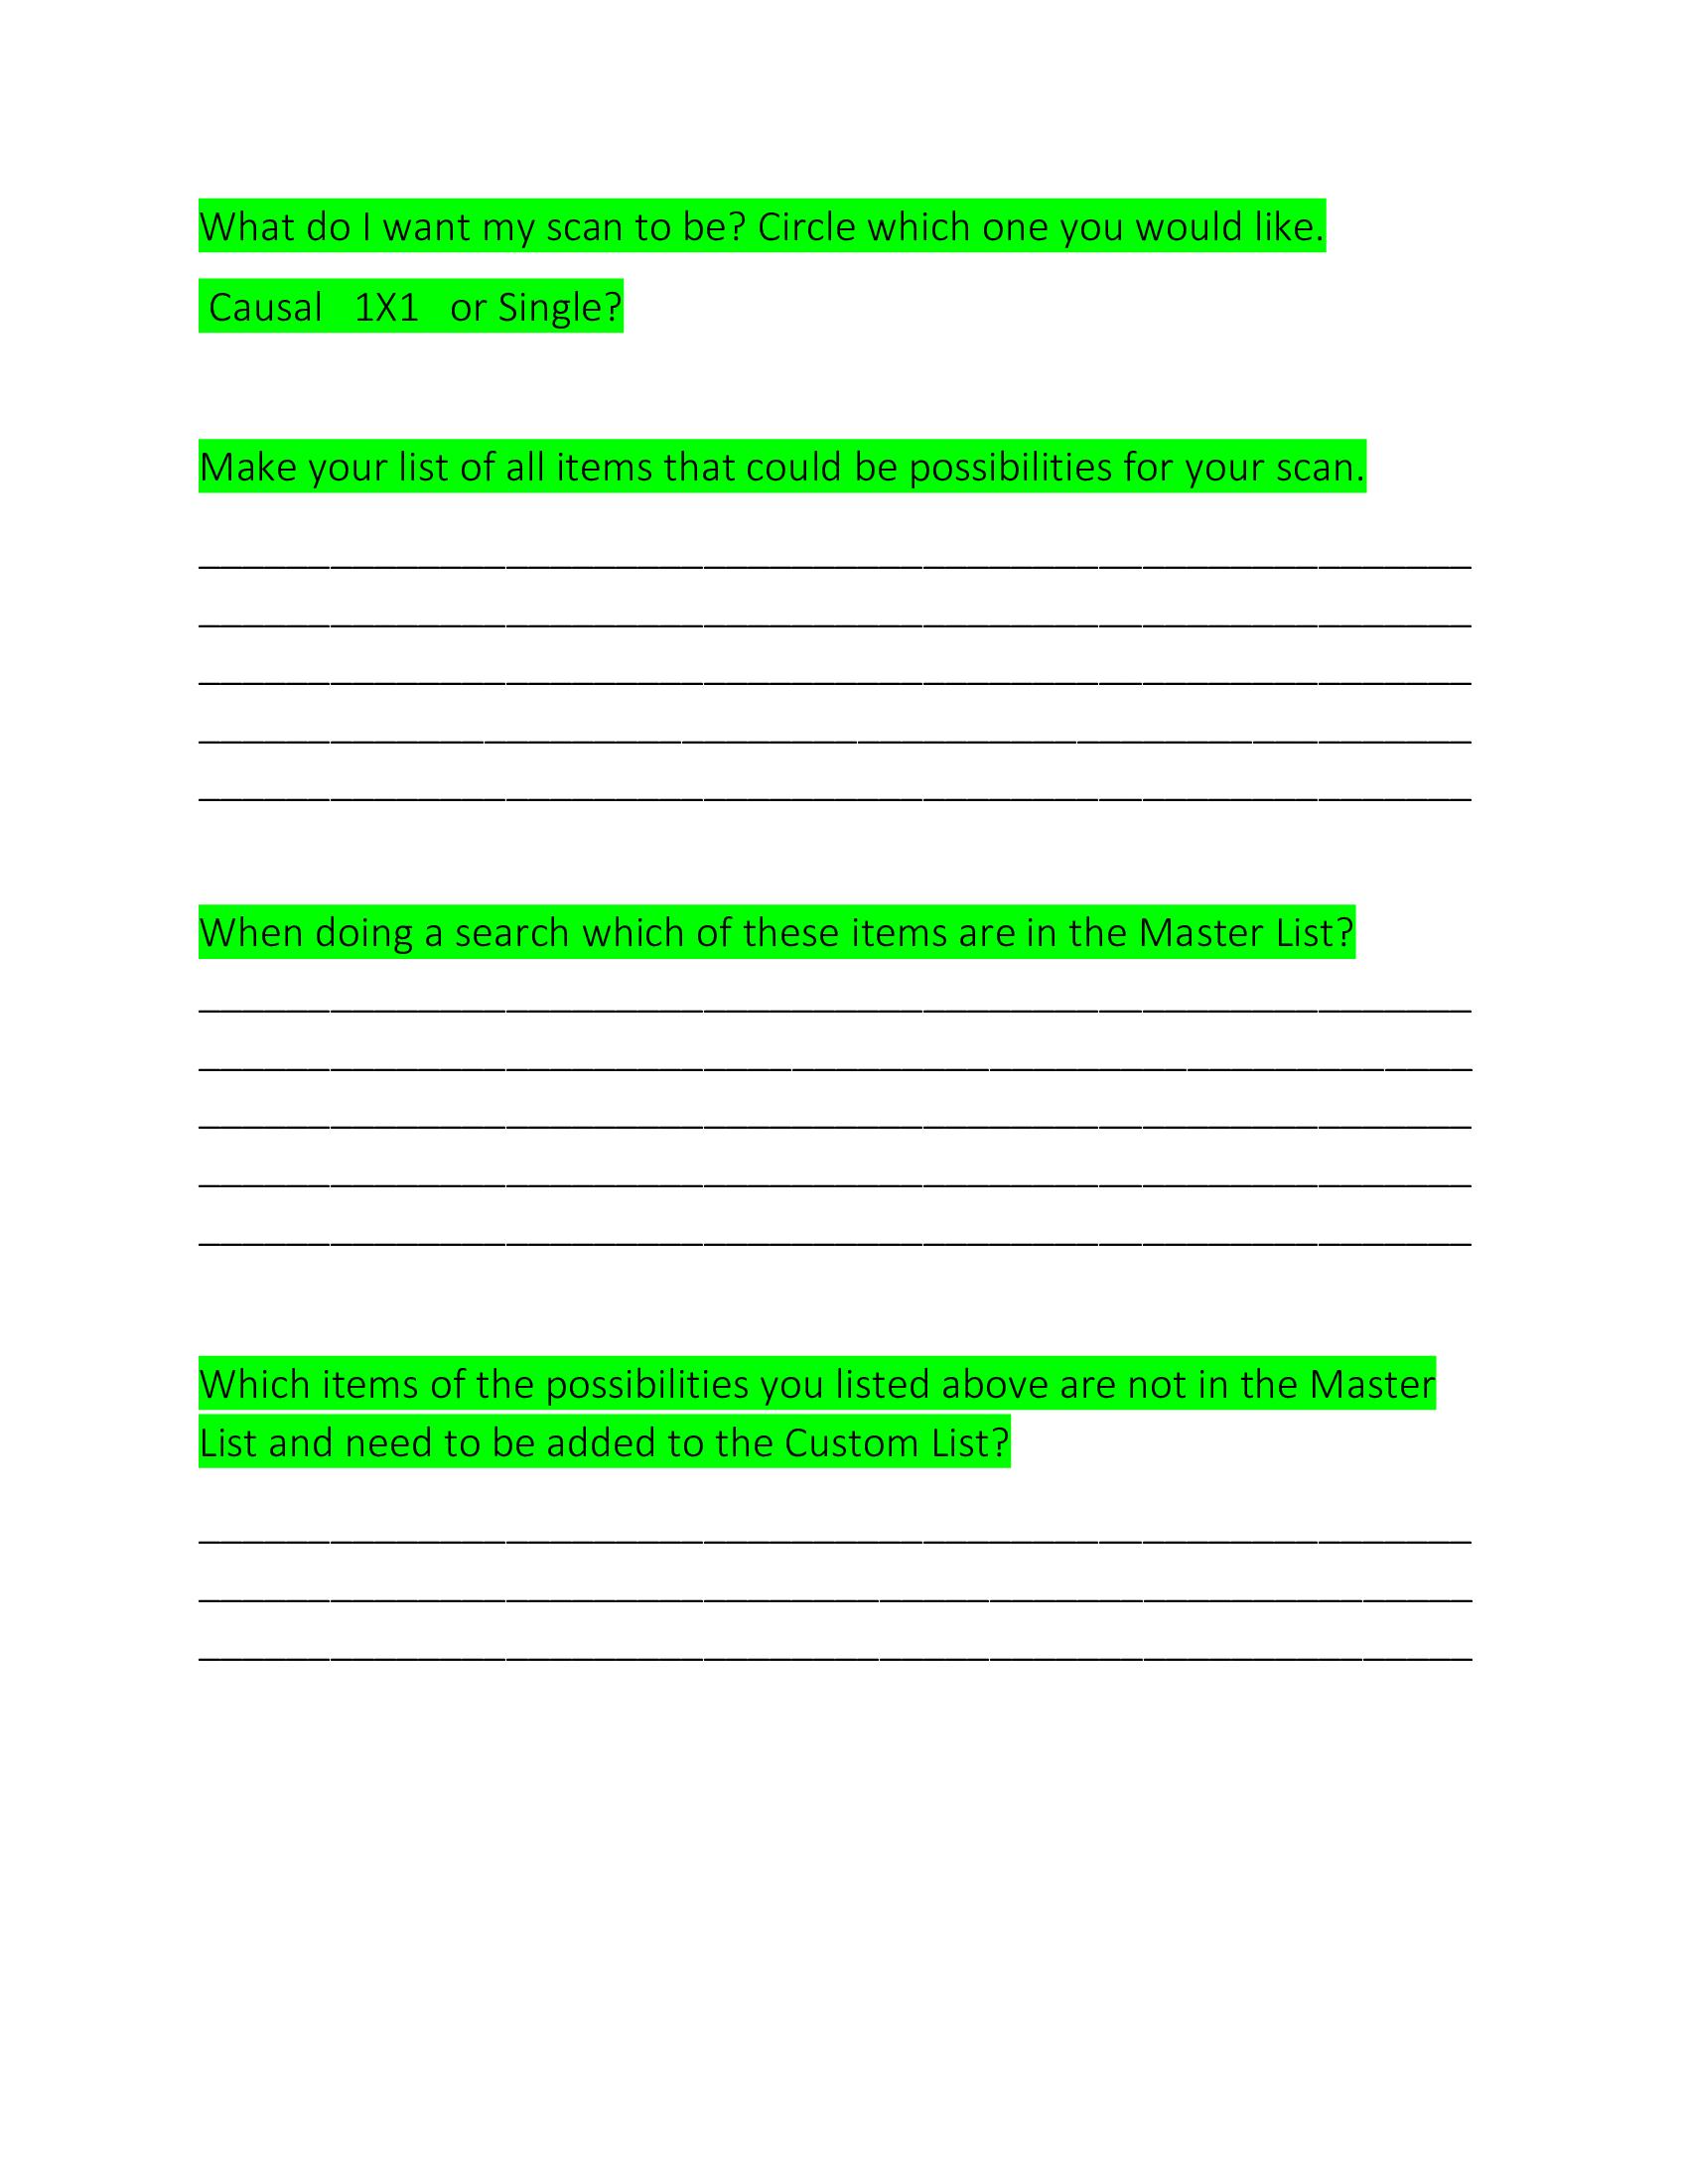 Create a Test Form